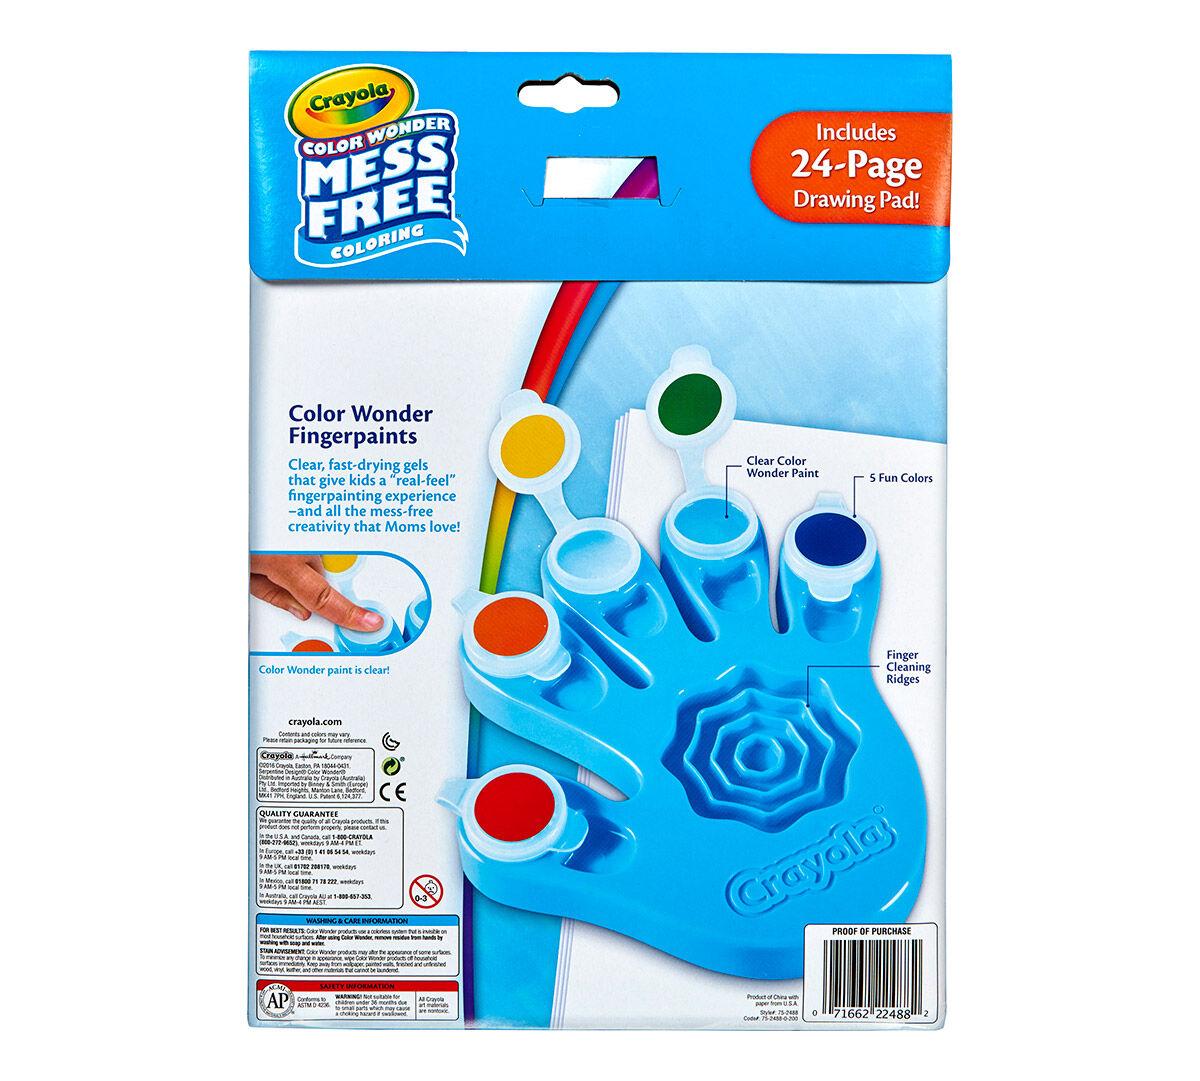 Color Wonder Fingerpaint Hand Crayola